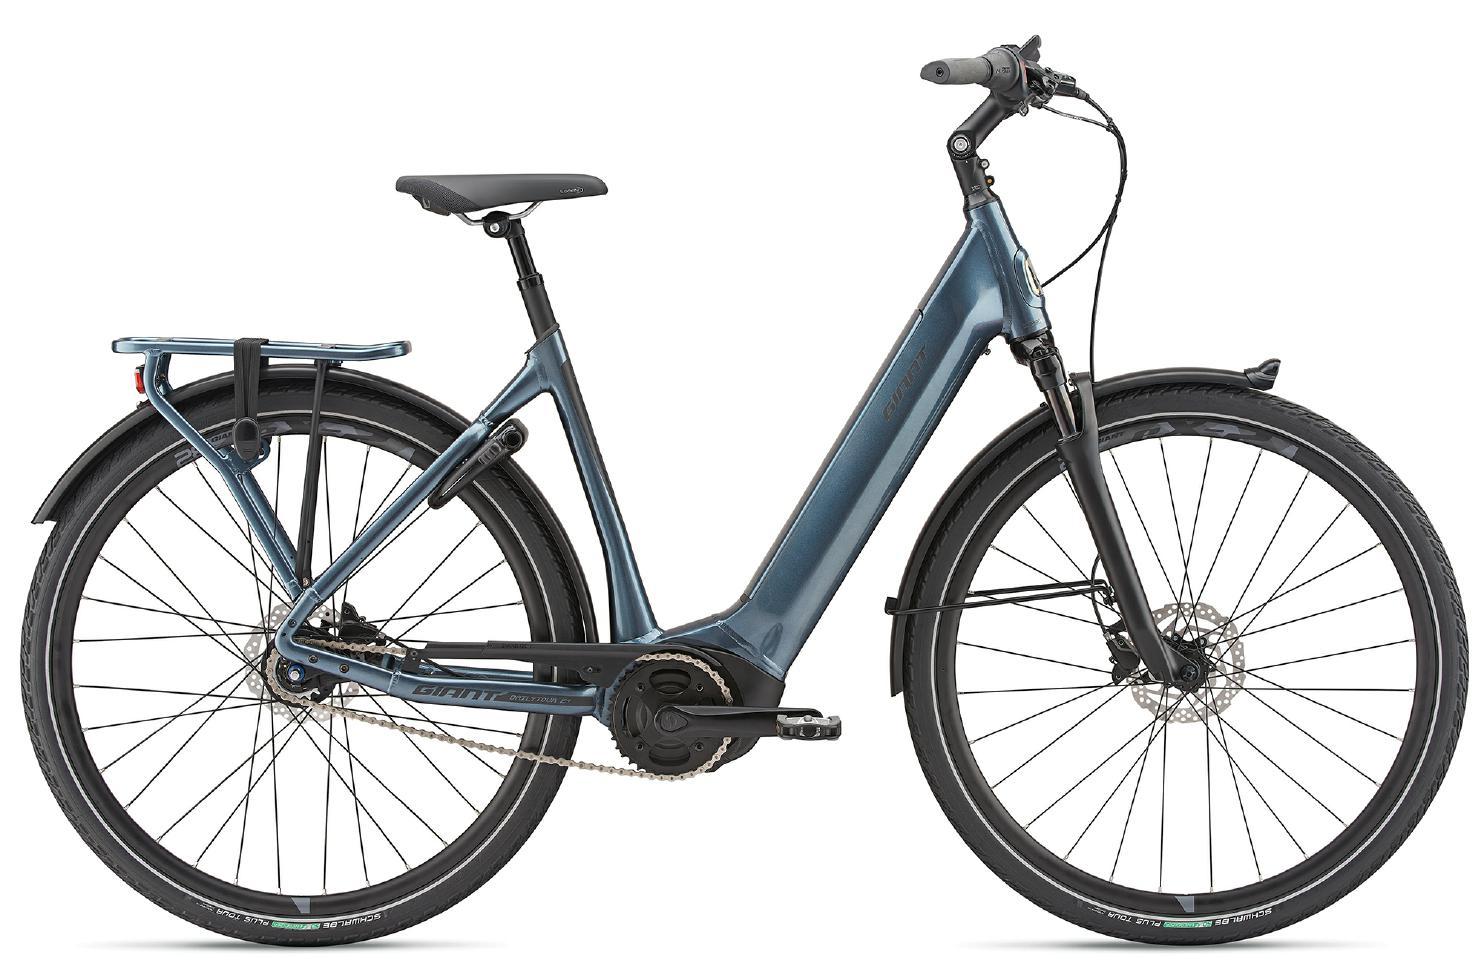 Giant Dailytour E+ 2 - LDS - Trekking e-Bike 2019